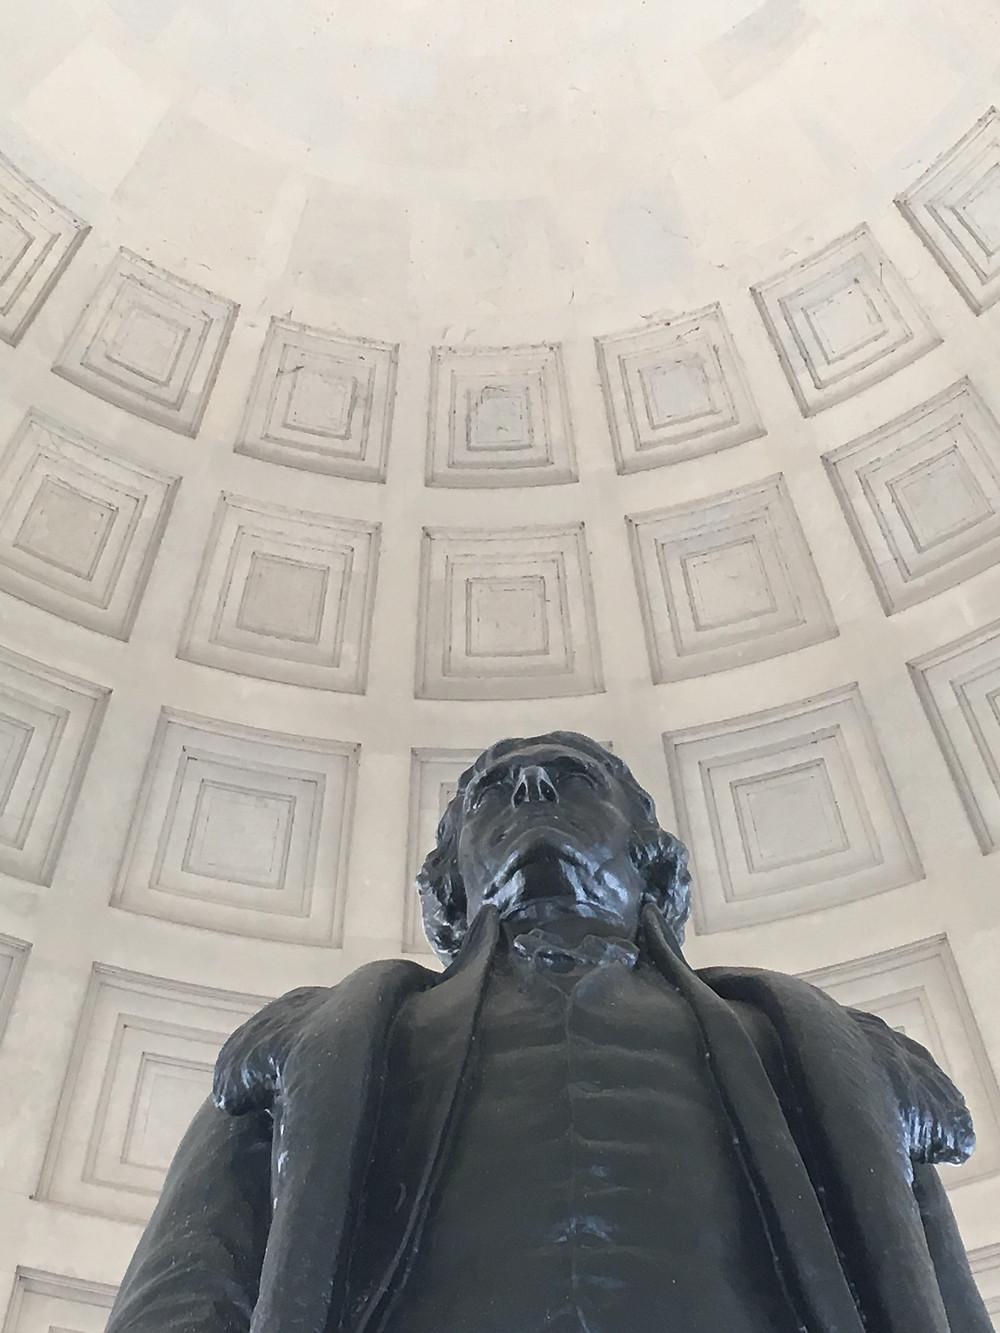 Thomas Jefferson statue at the Jefferson Memorial in Washington, D.C.